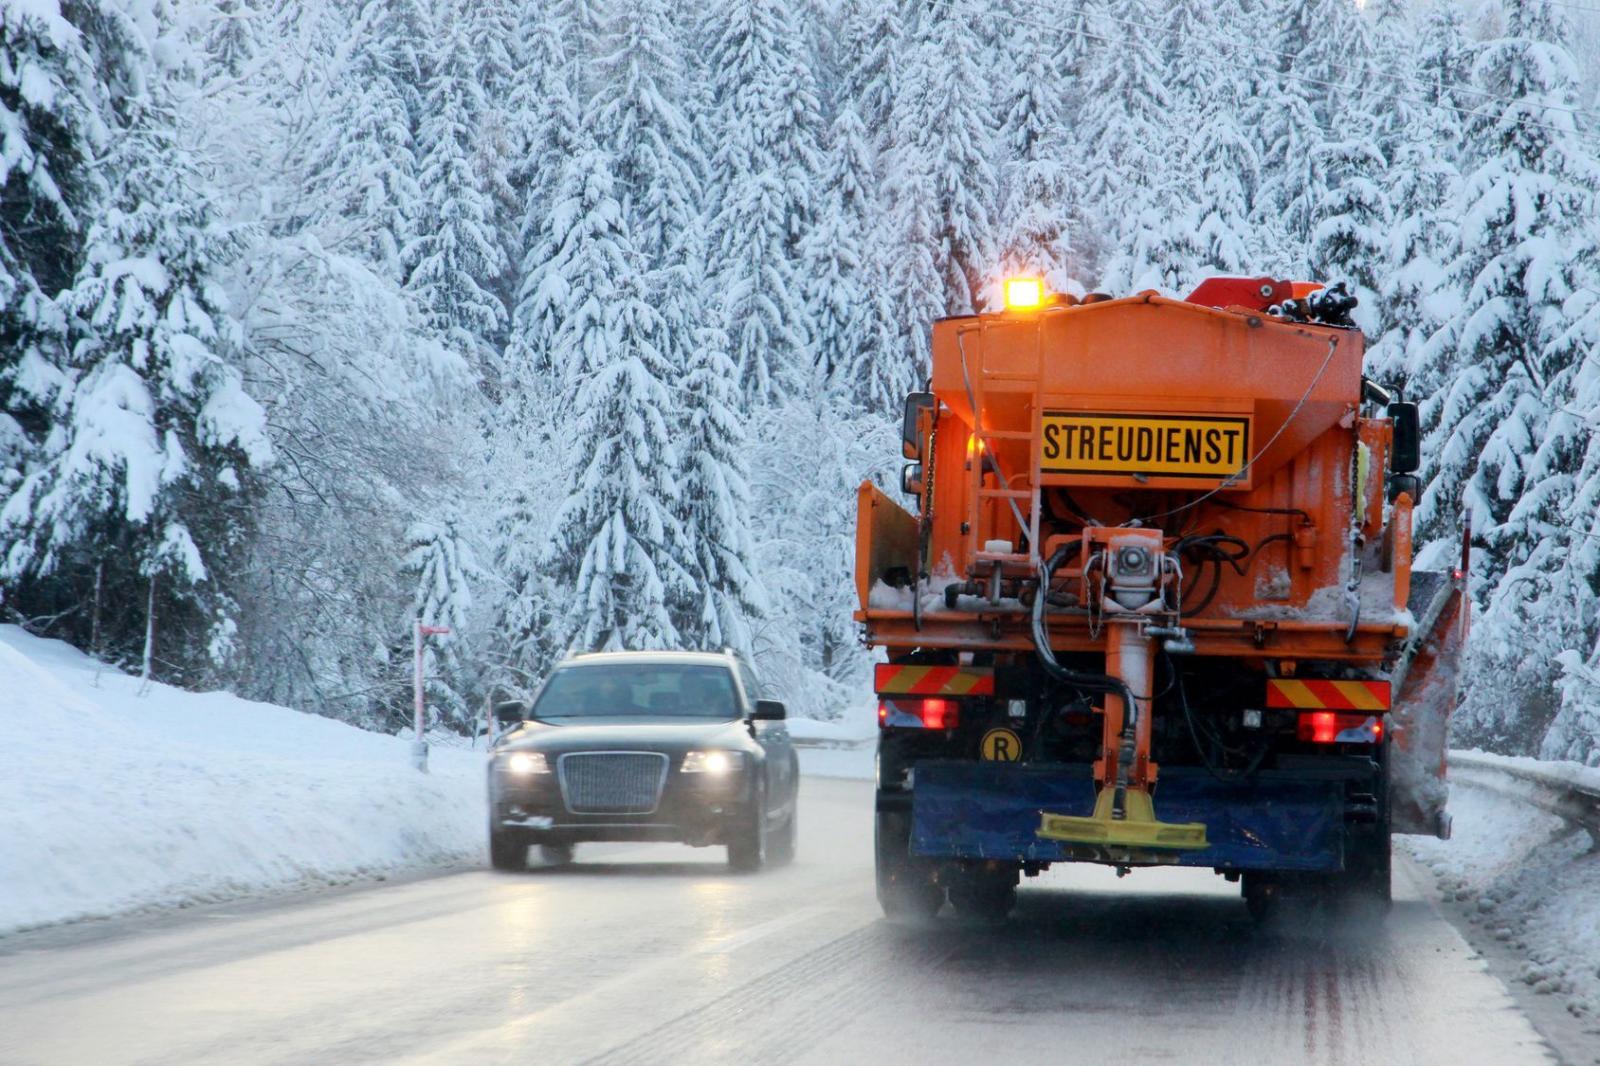 Auto-Tuning-Schnee-4-Fotolia.jpg